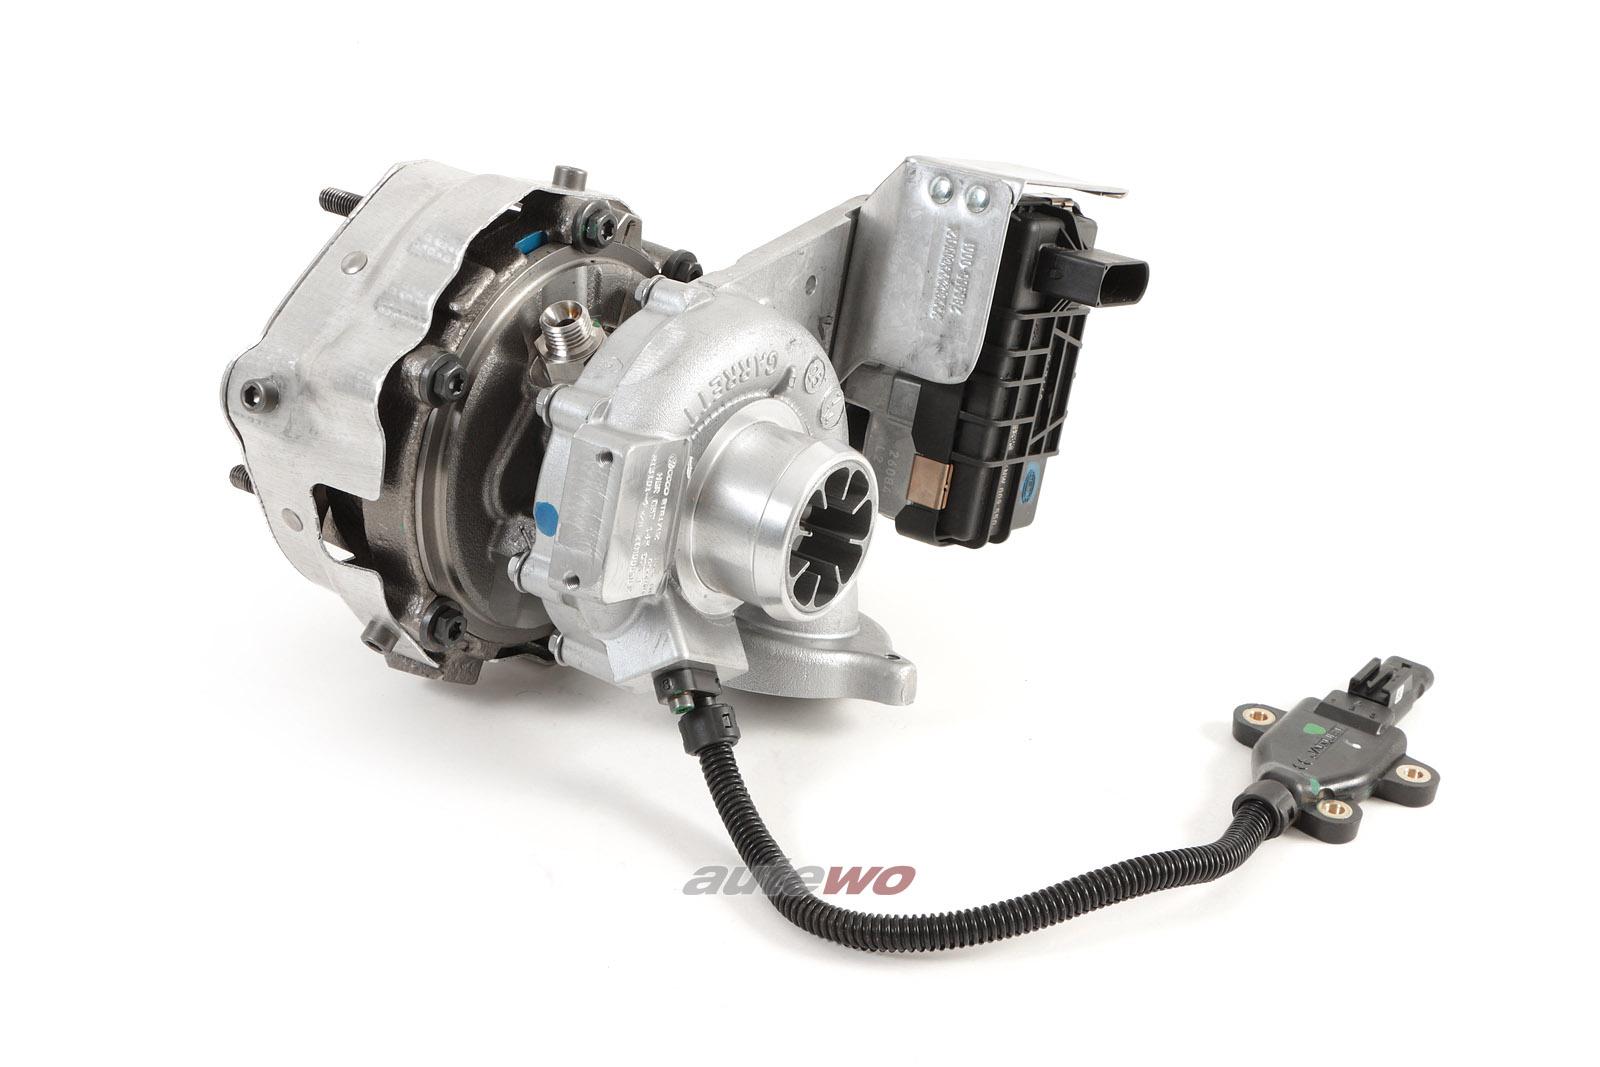 057145873T NEU Audi A8 D4/4H 4.2l TDI original Abgasturbolader Links